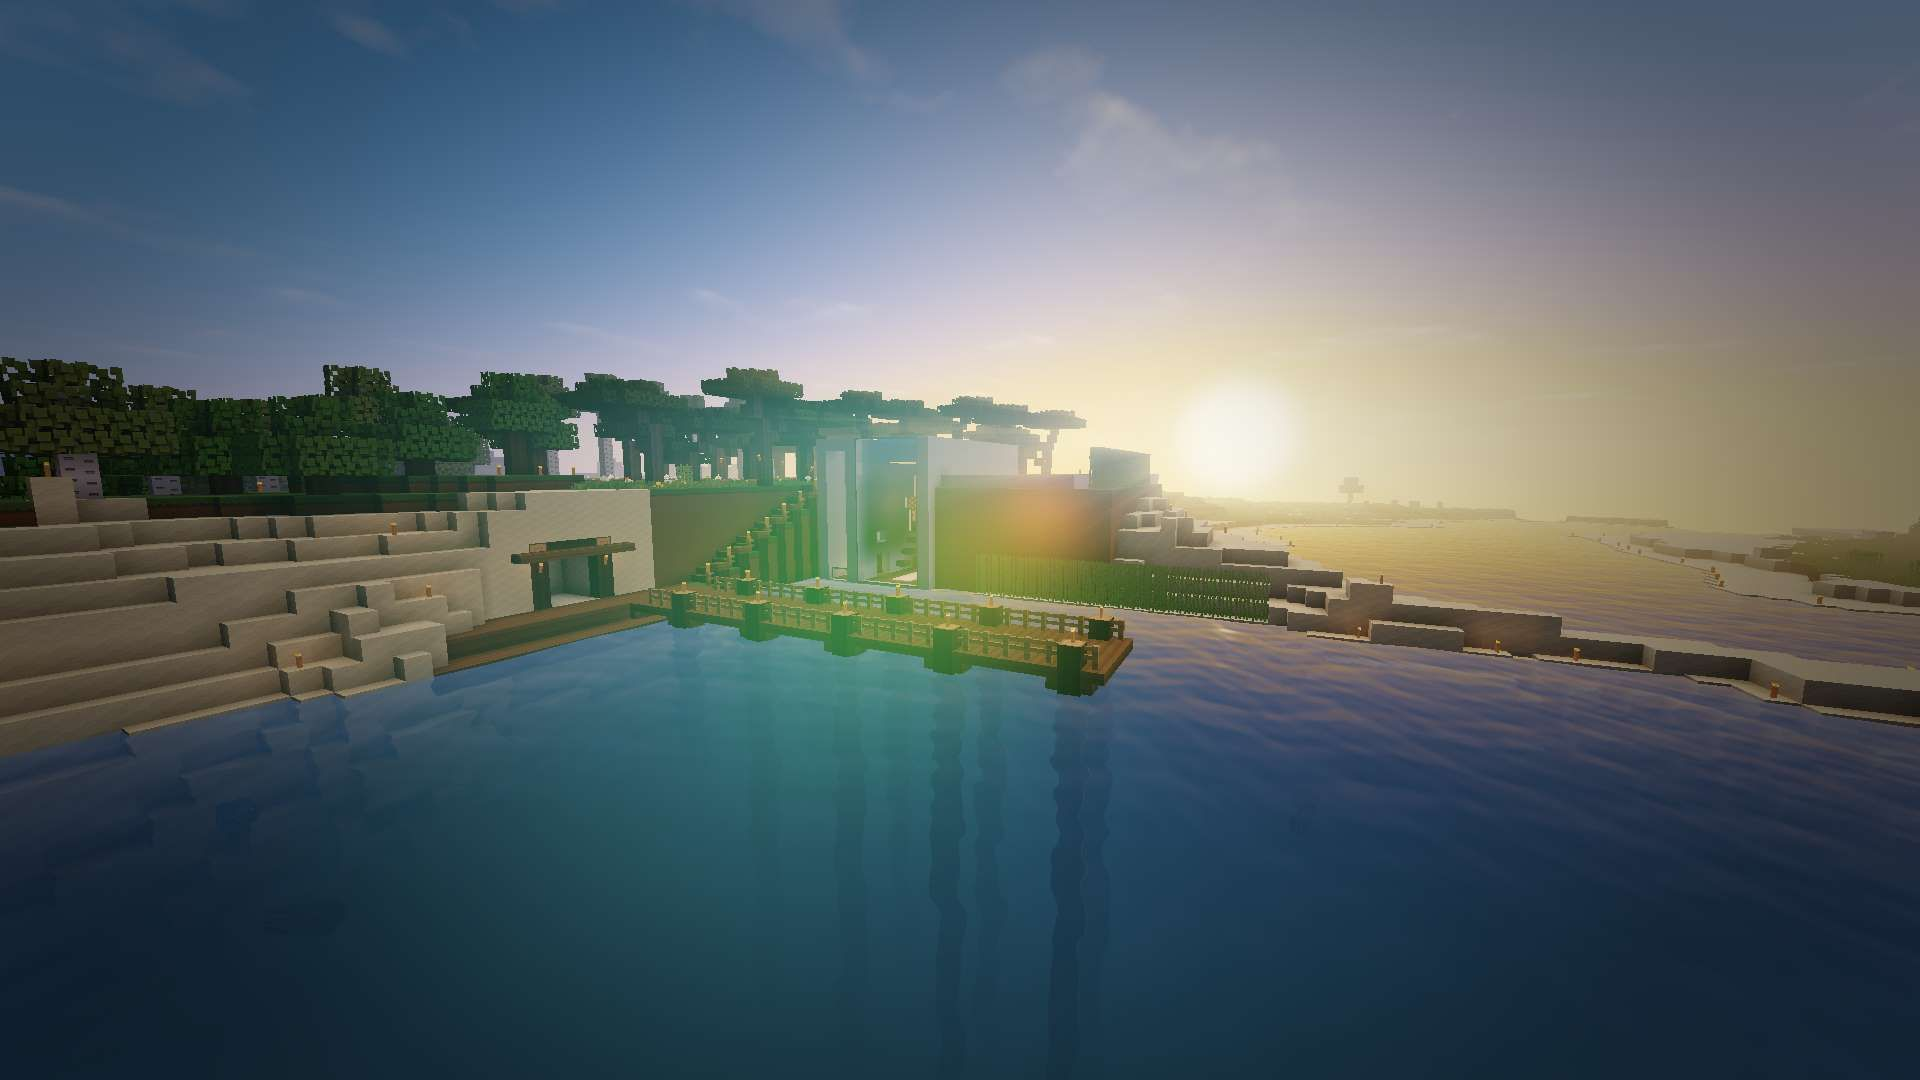 Simple Wallpaper Minecraft Beach - a702cd9081f37f5da75c376848aa0a49  Best Photo Reference_87089.jpg